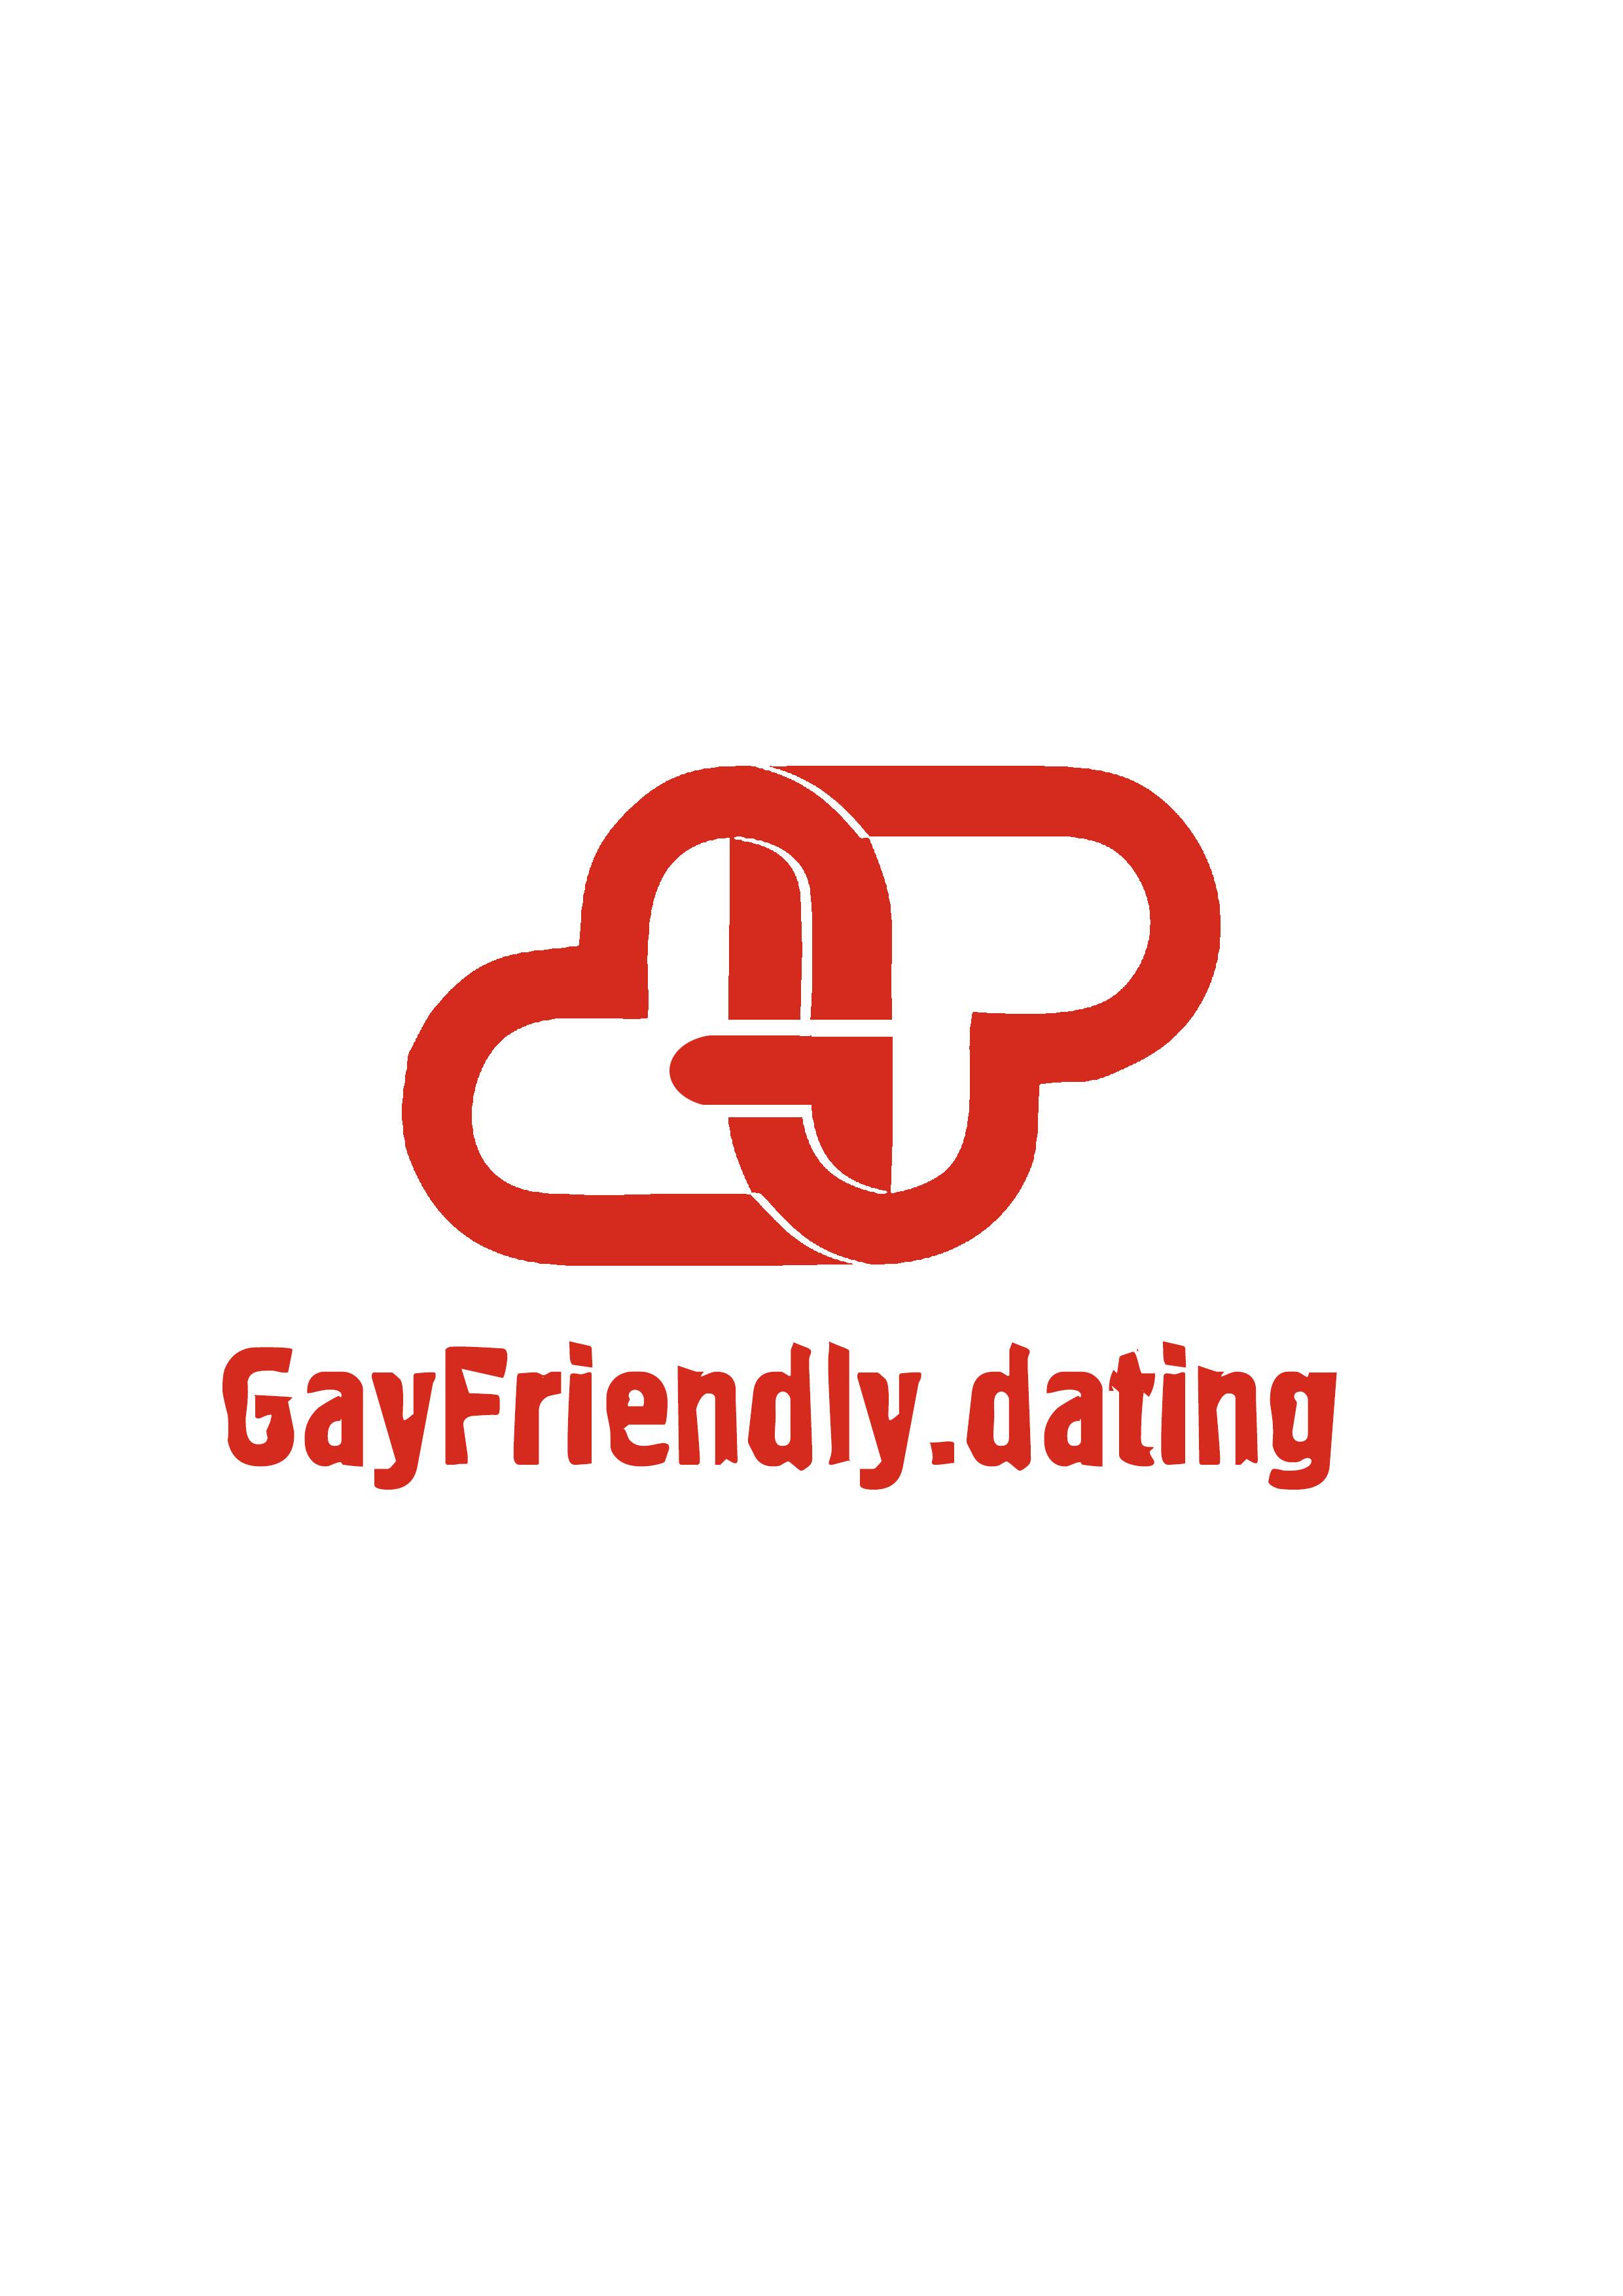 Разработать логотип для англоязычн. сайта знакомств для геев фото f_9505b5b84530c6fc.jpg